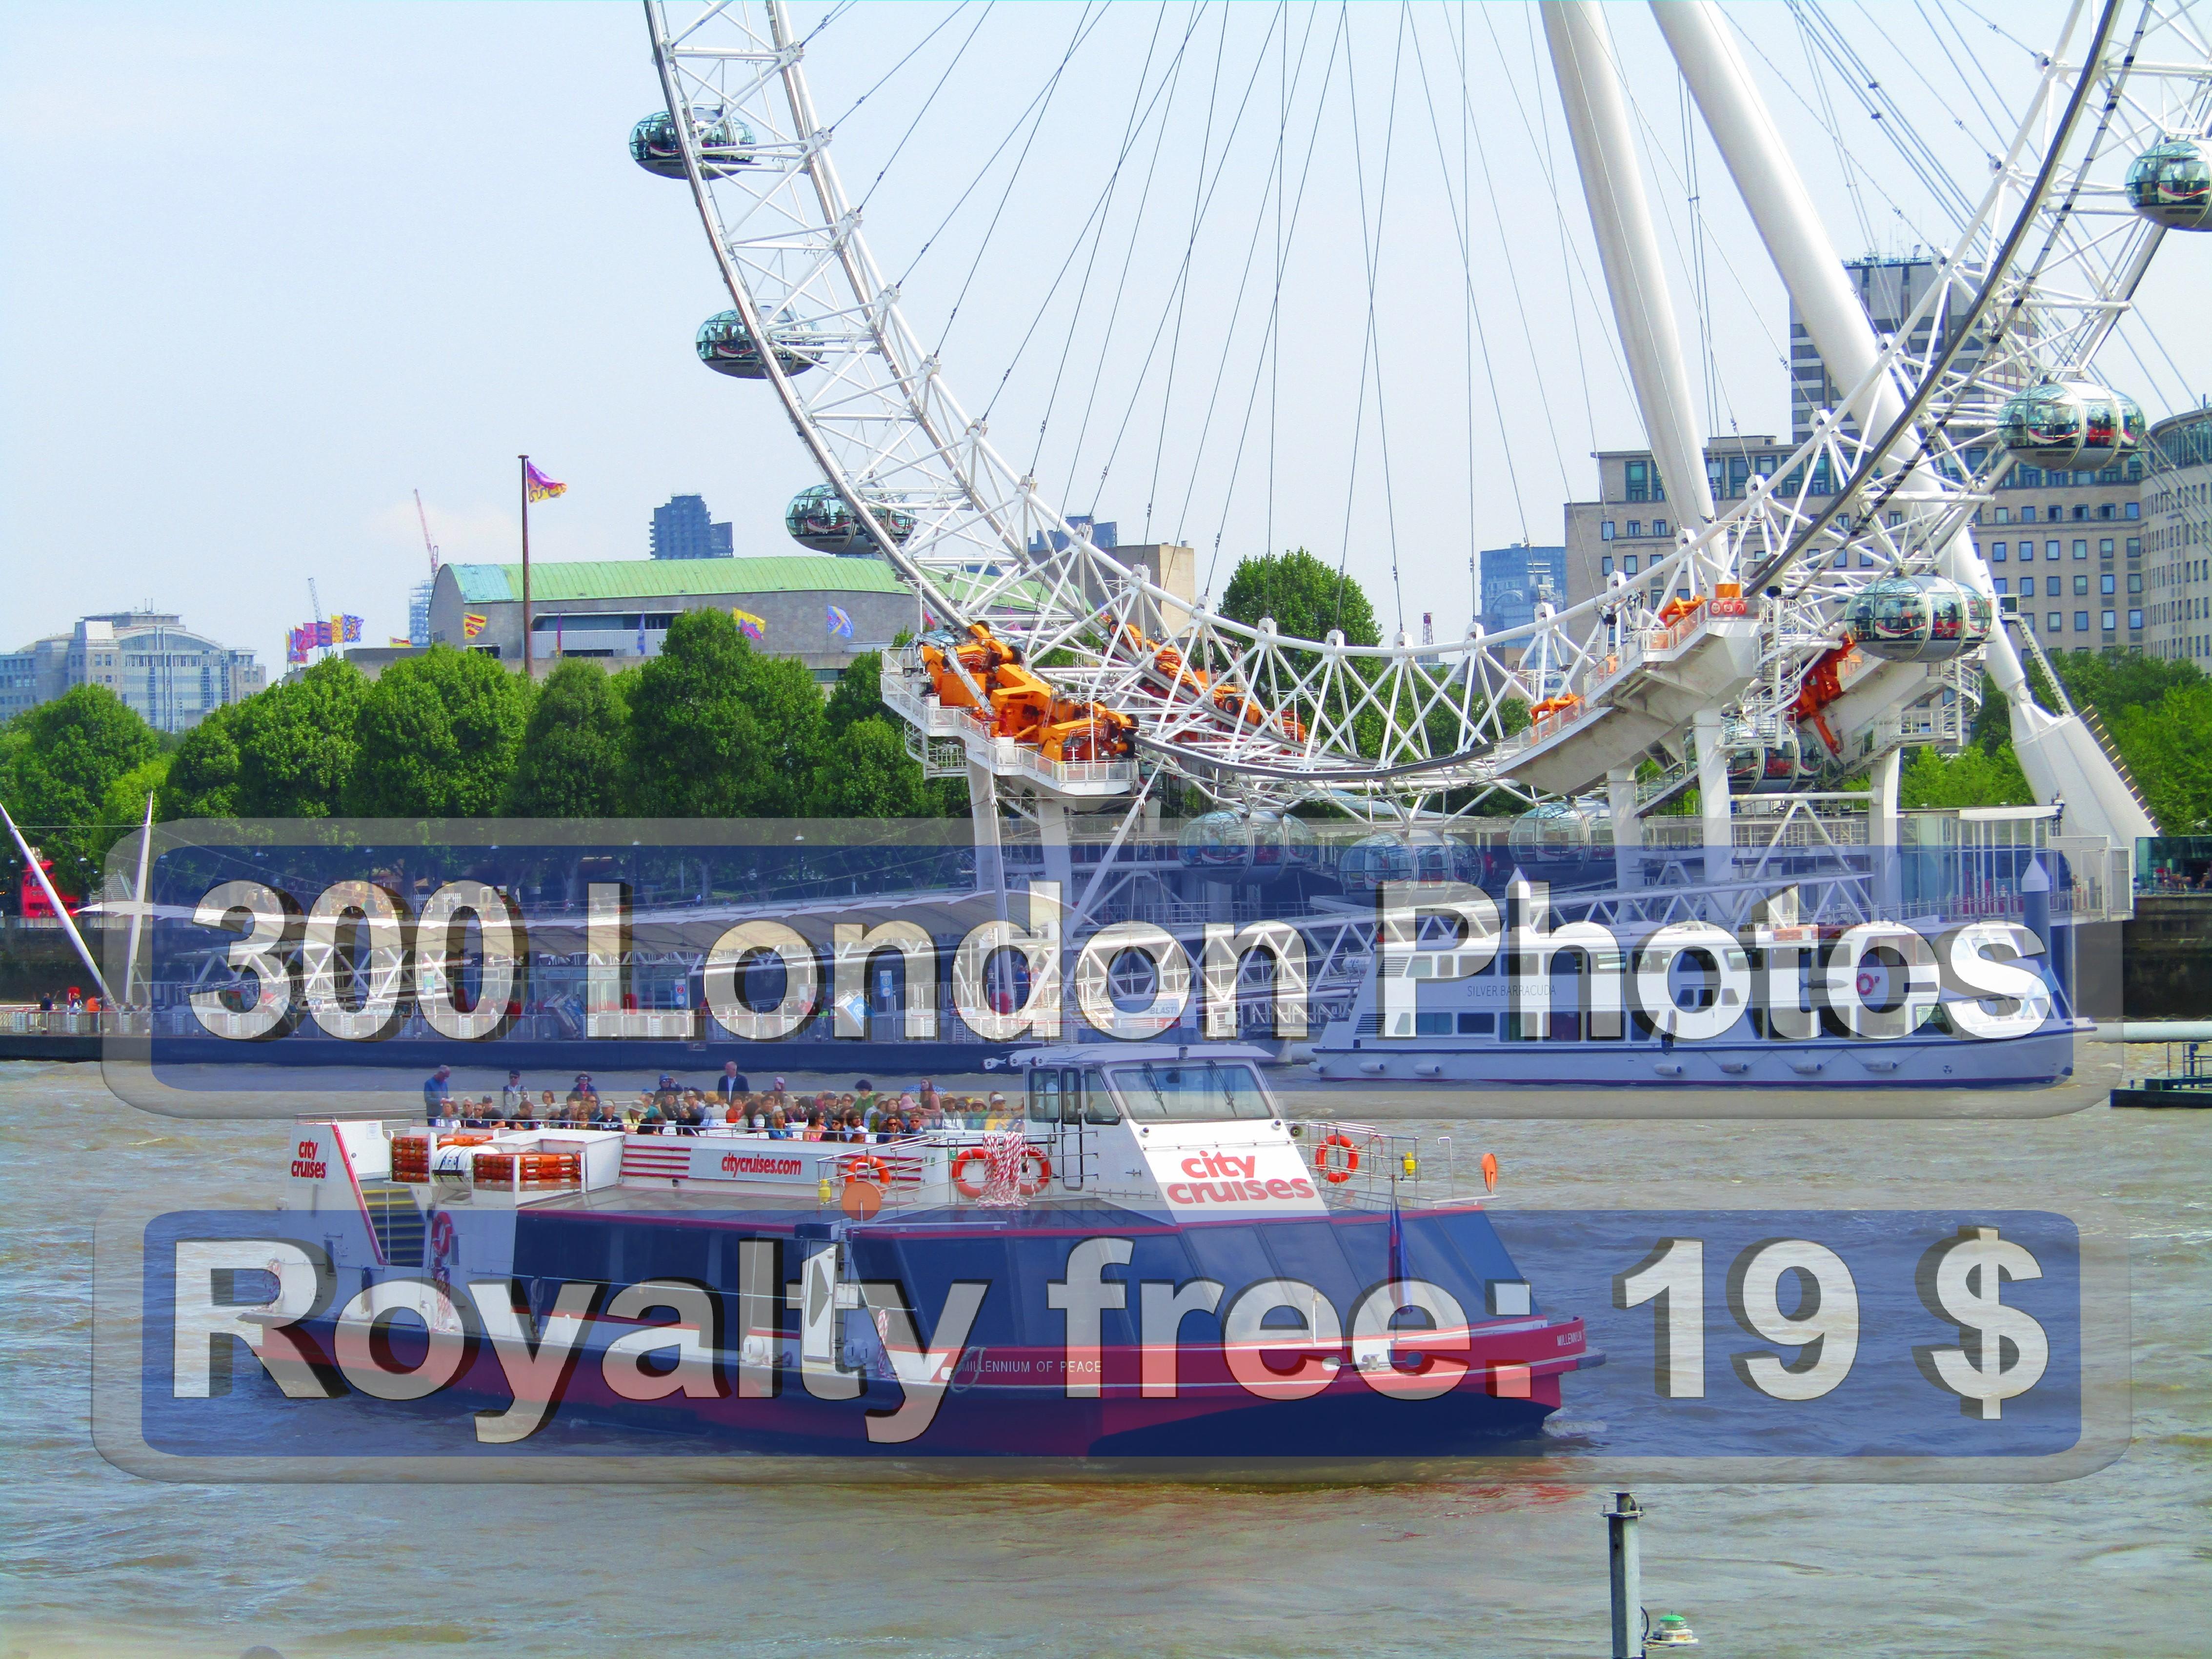 London Photo Exhibition 2018